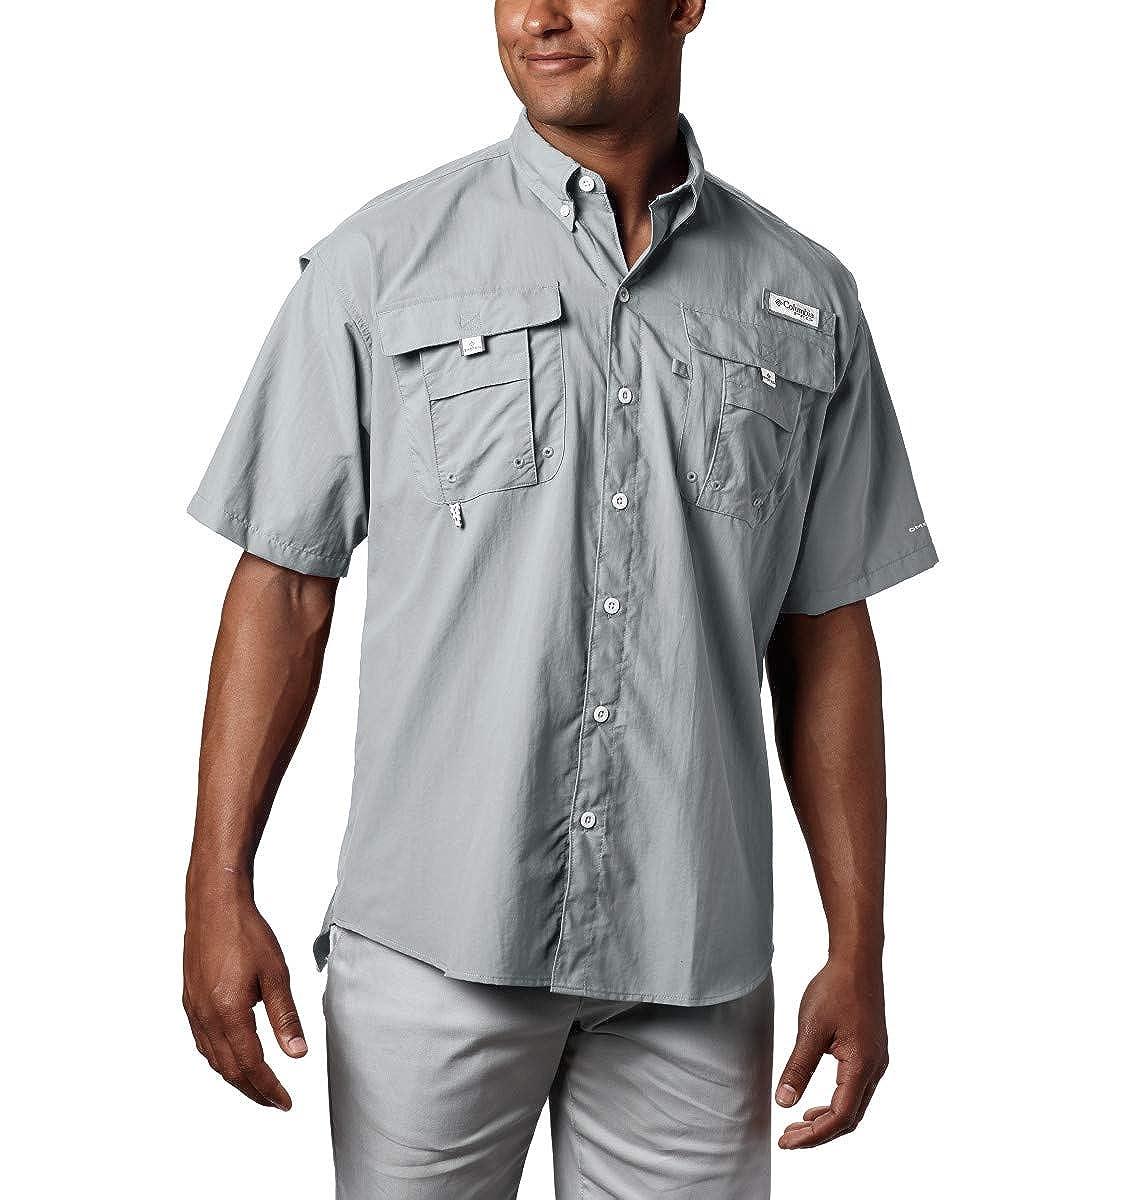 Columbia Men's PFG Bahama II Short Sleeve Shirt, Cool Grey, Large